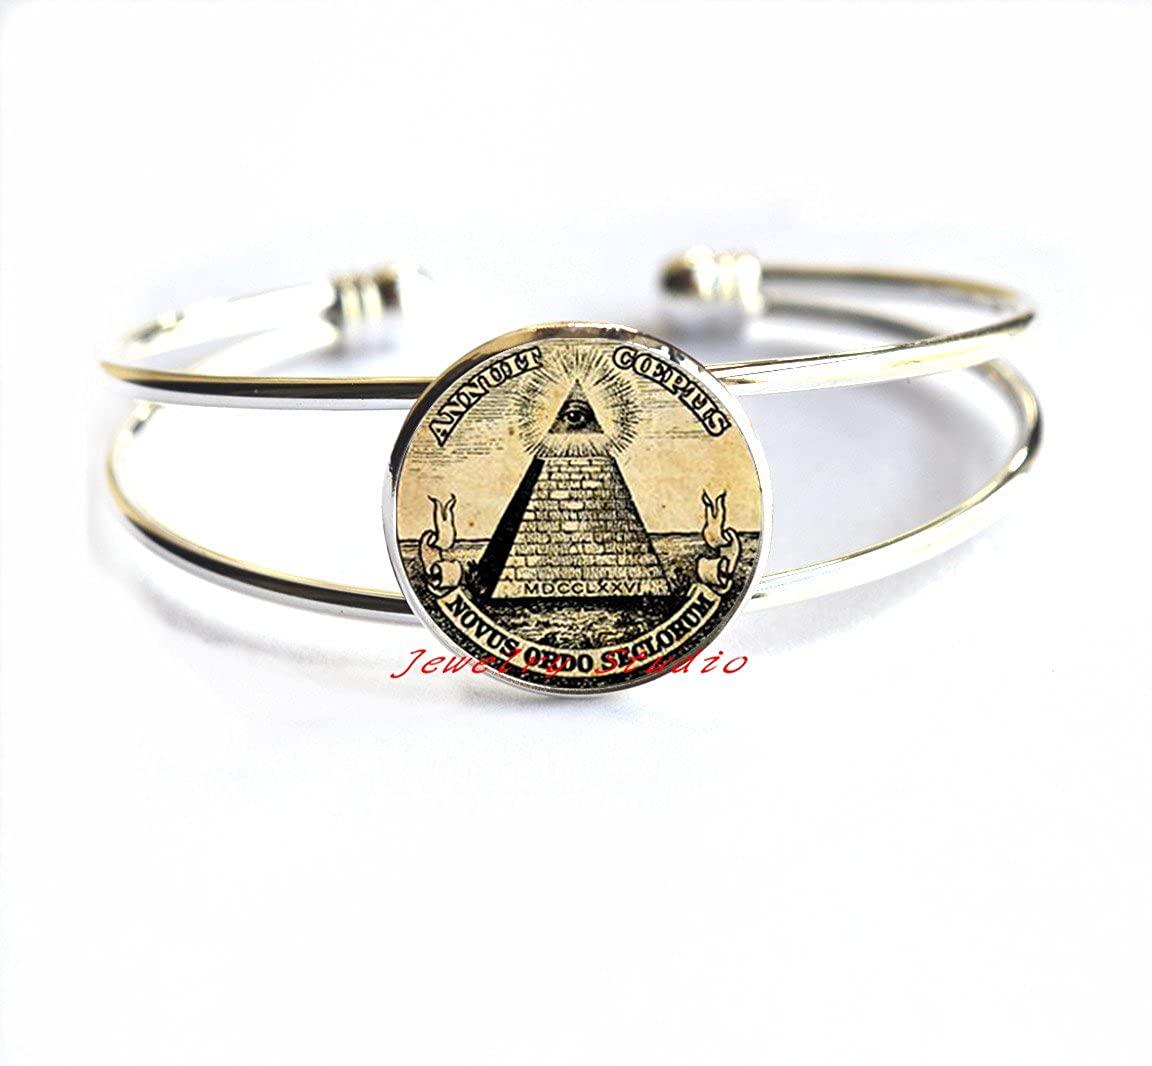 Charming Bracelet,Masonic Jewelry, Novus Ordo Seclorum Bracelets, Occult Pyramid Bracelet, Magic Amulet, Esoteric, Sacred Jewelry,T0026